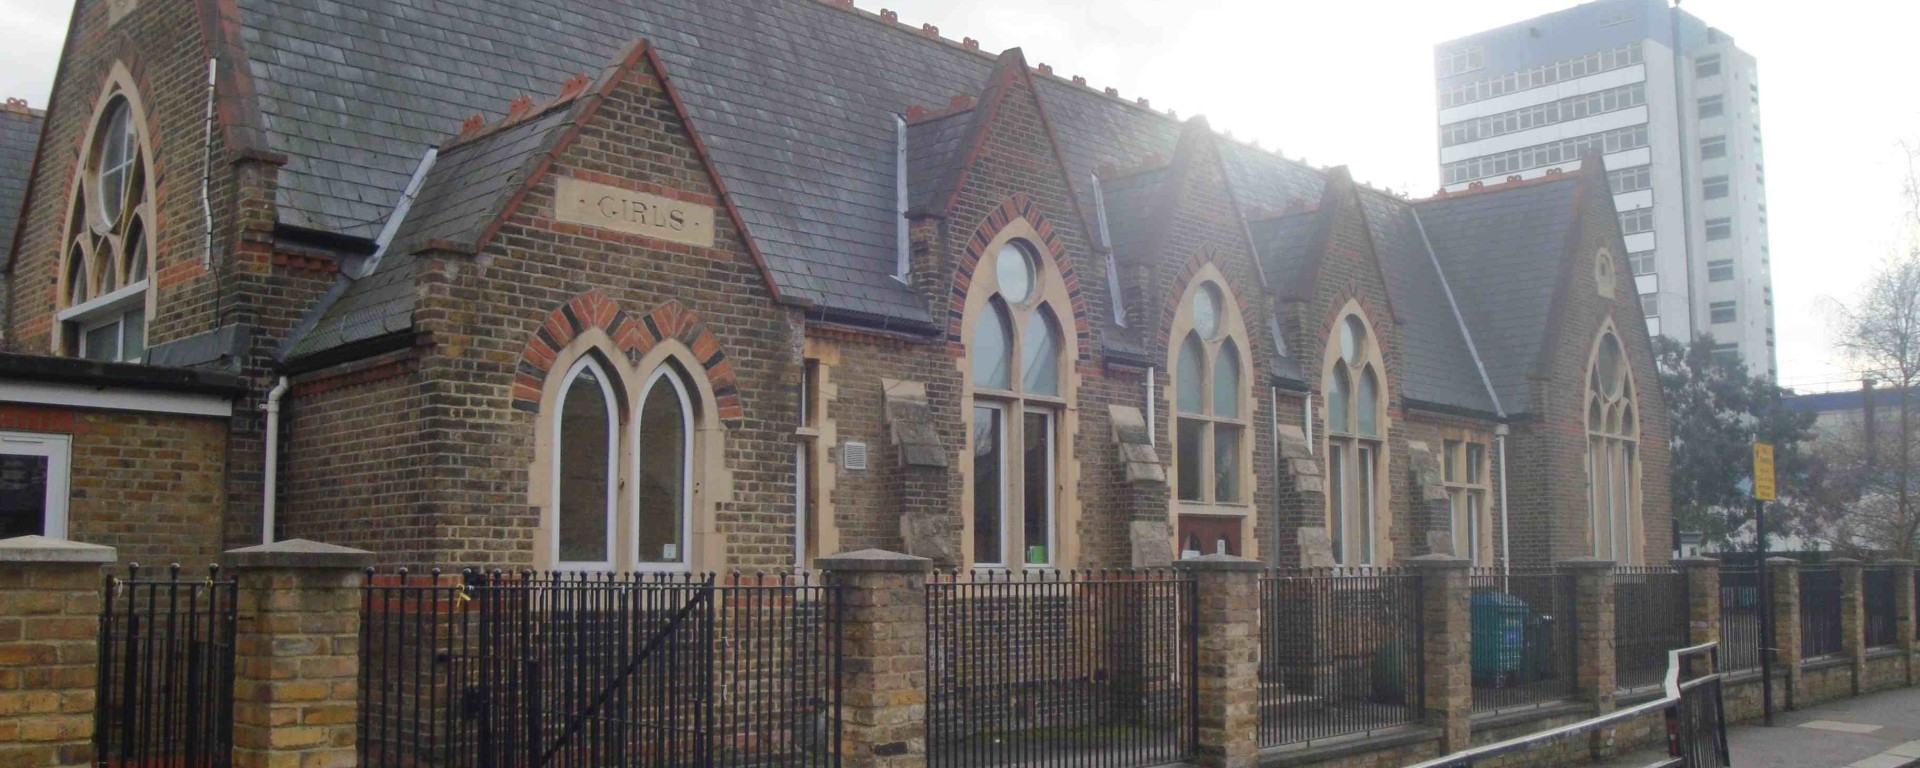 St Paul's Church of England Primary School